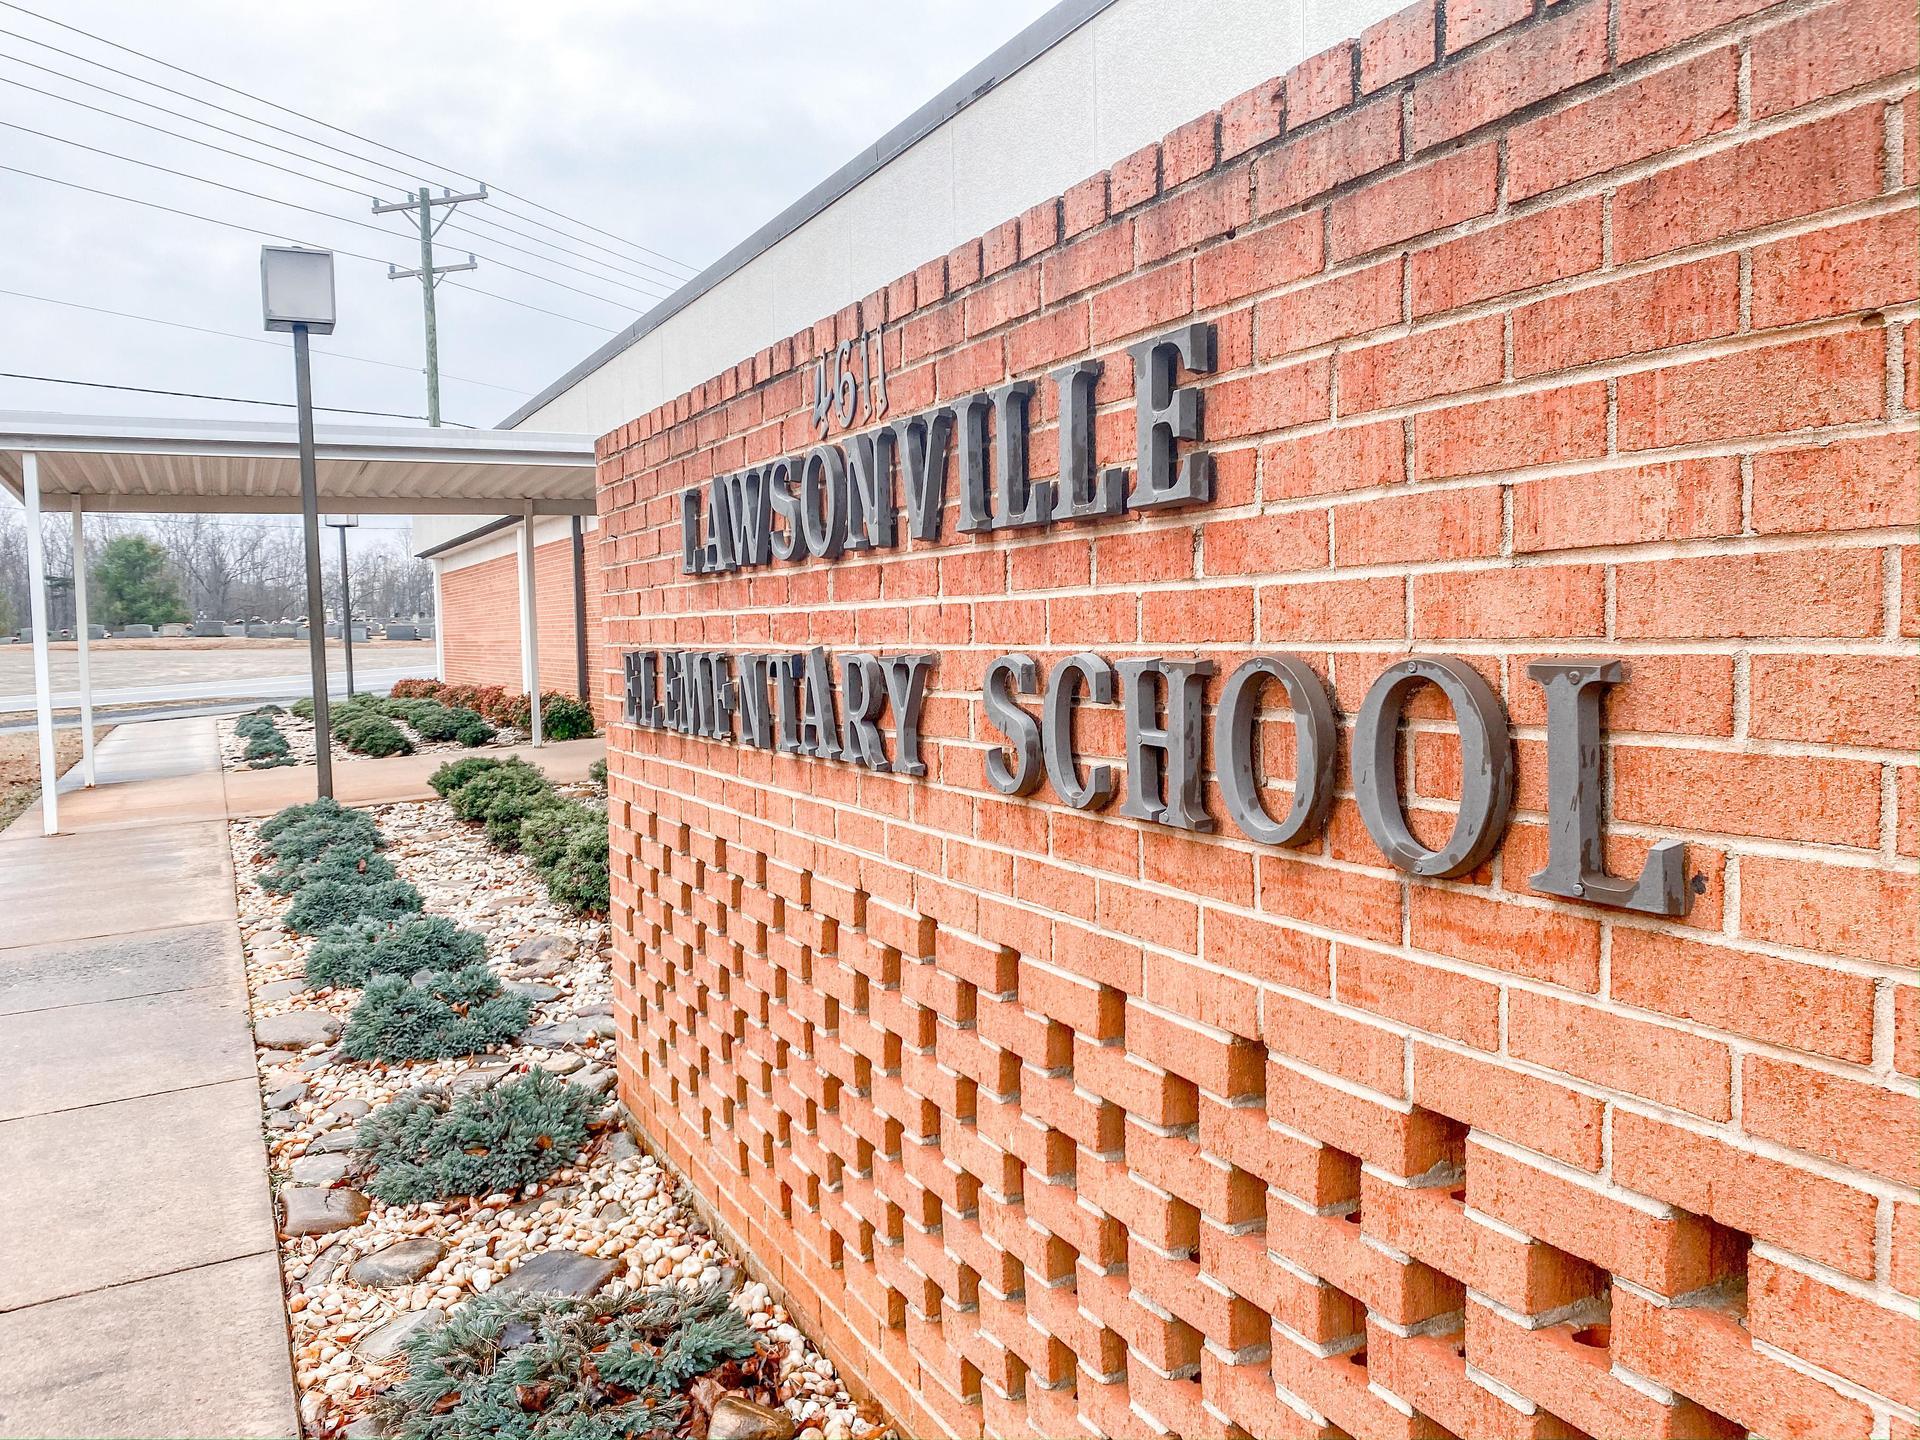 Lawsonville Elementary School